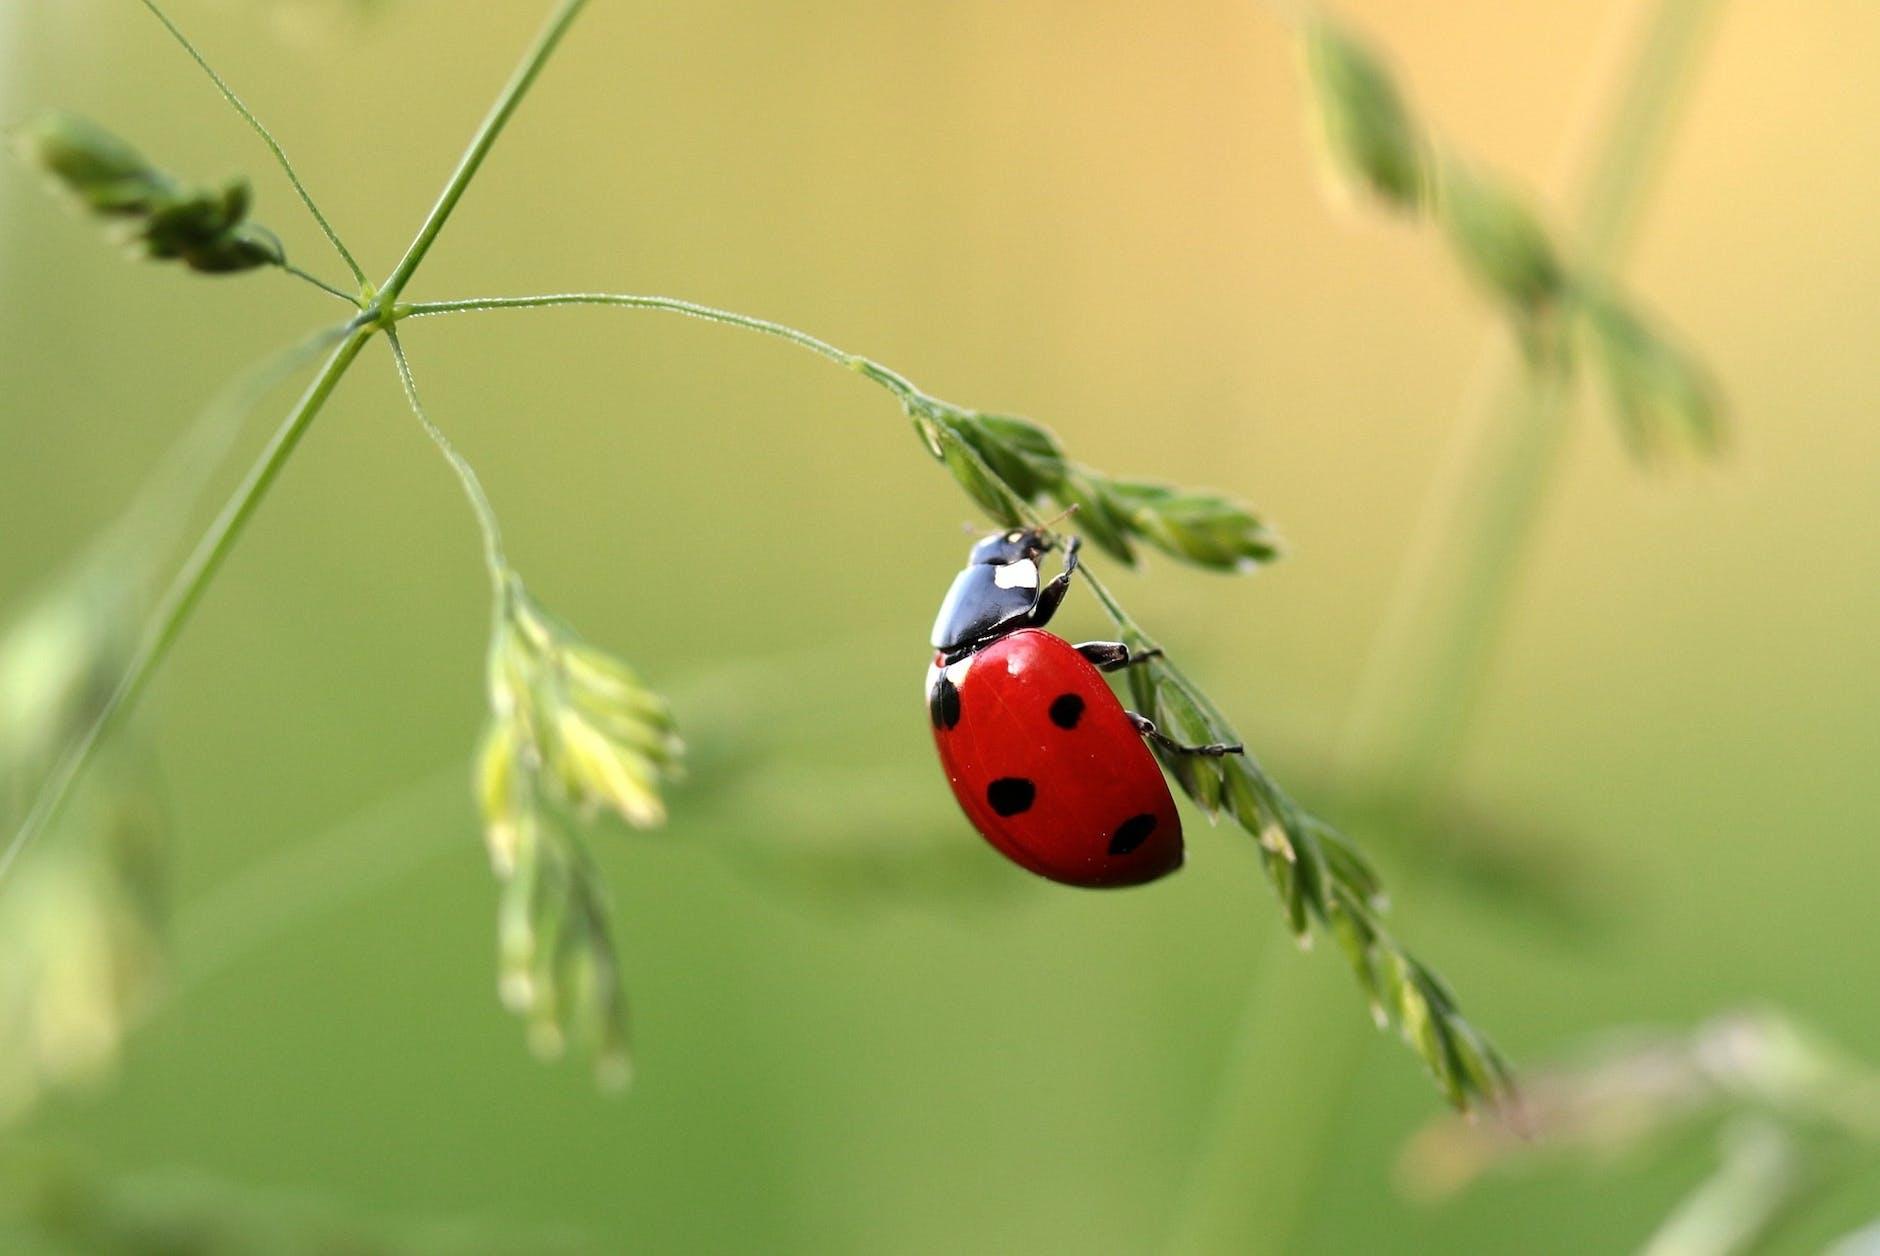 https://images.pexels.com/photos/121472/ladybug-beetle-coccinellidae-insect-121472.jpeg?auto=compress&cs=tinysrgb&dpr=2&h=650&w=940